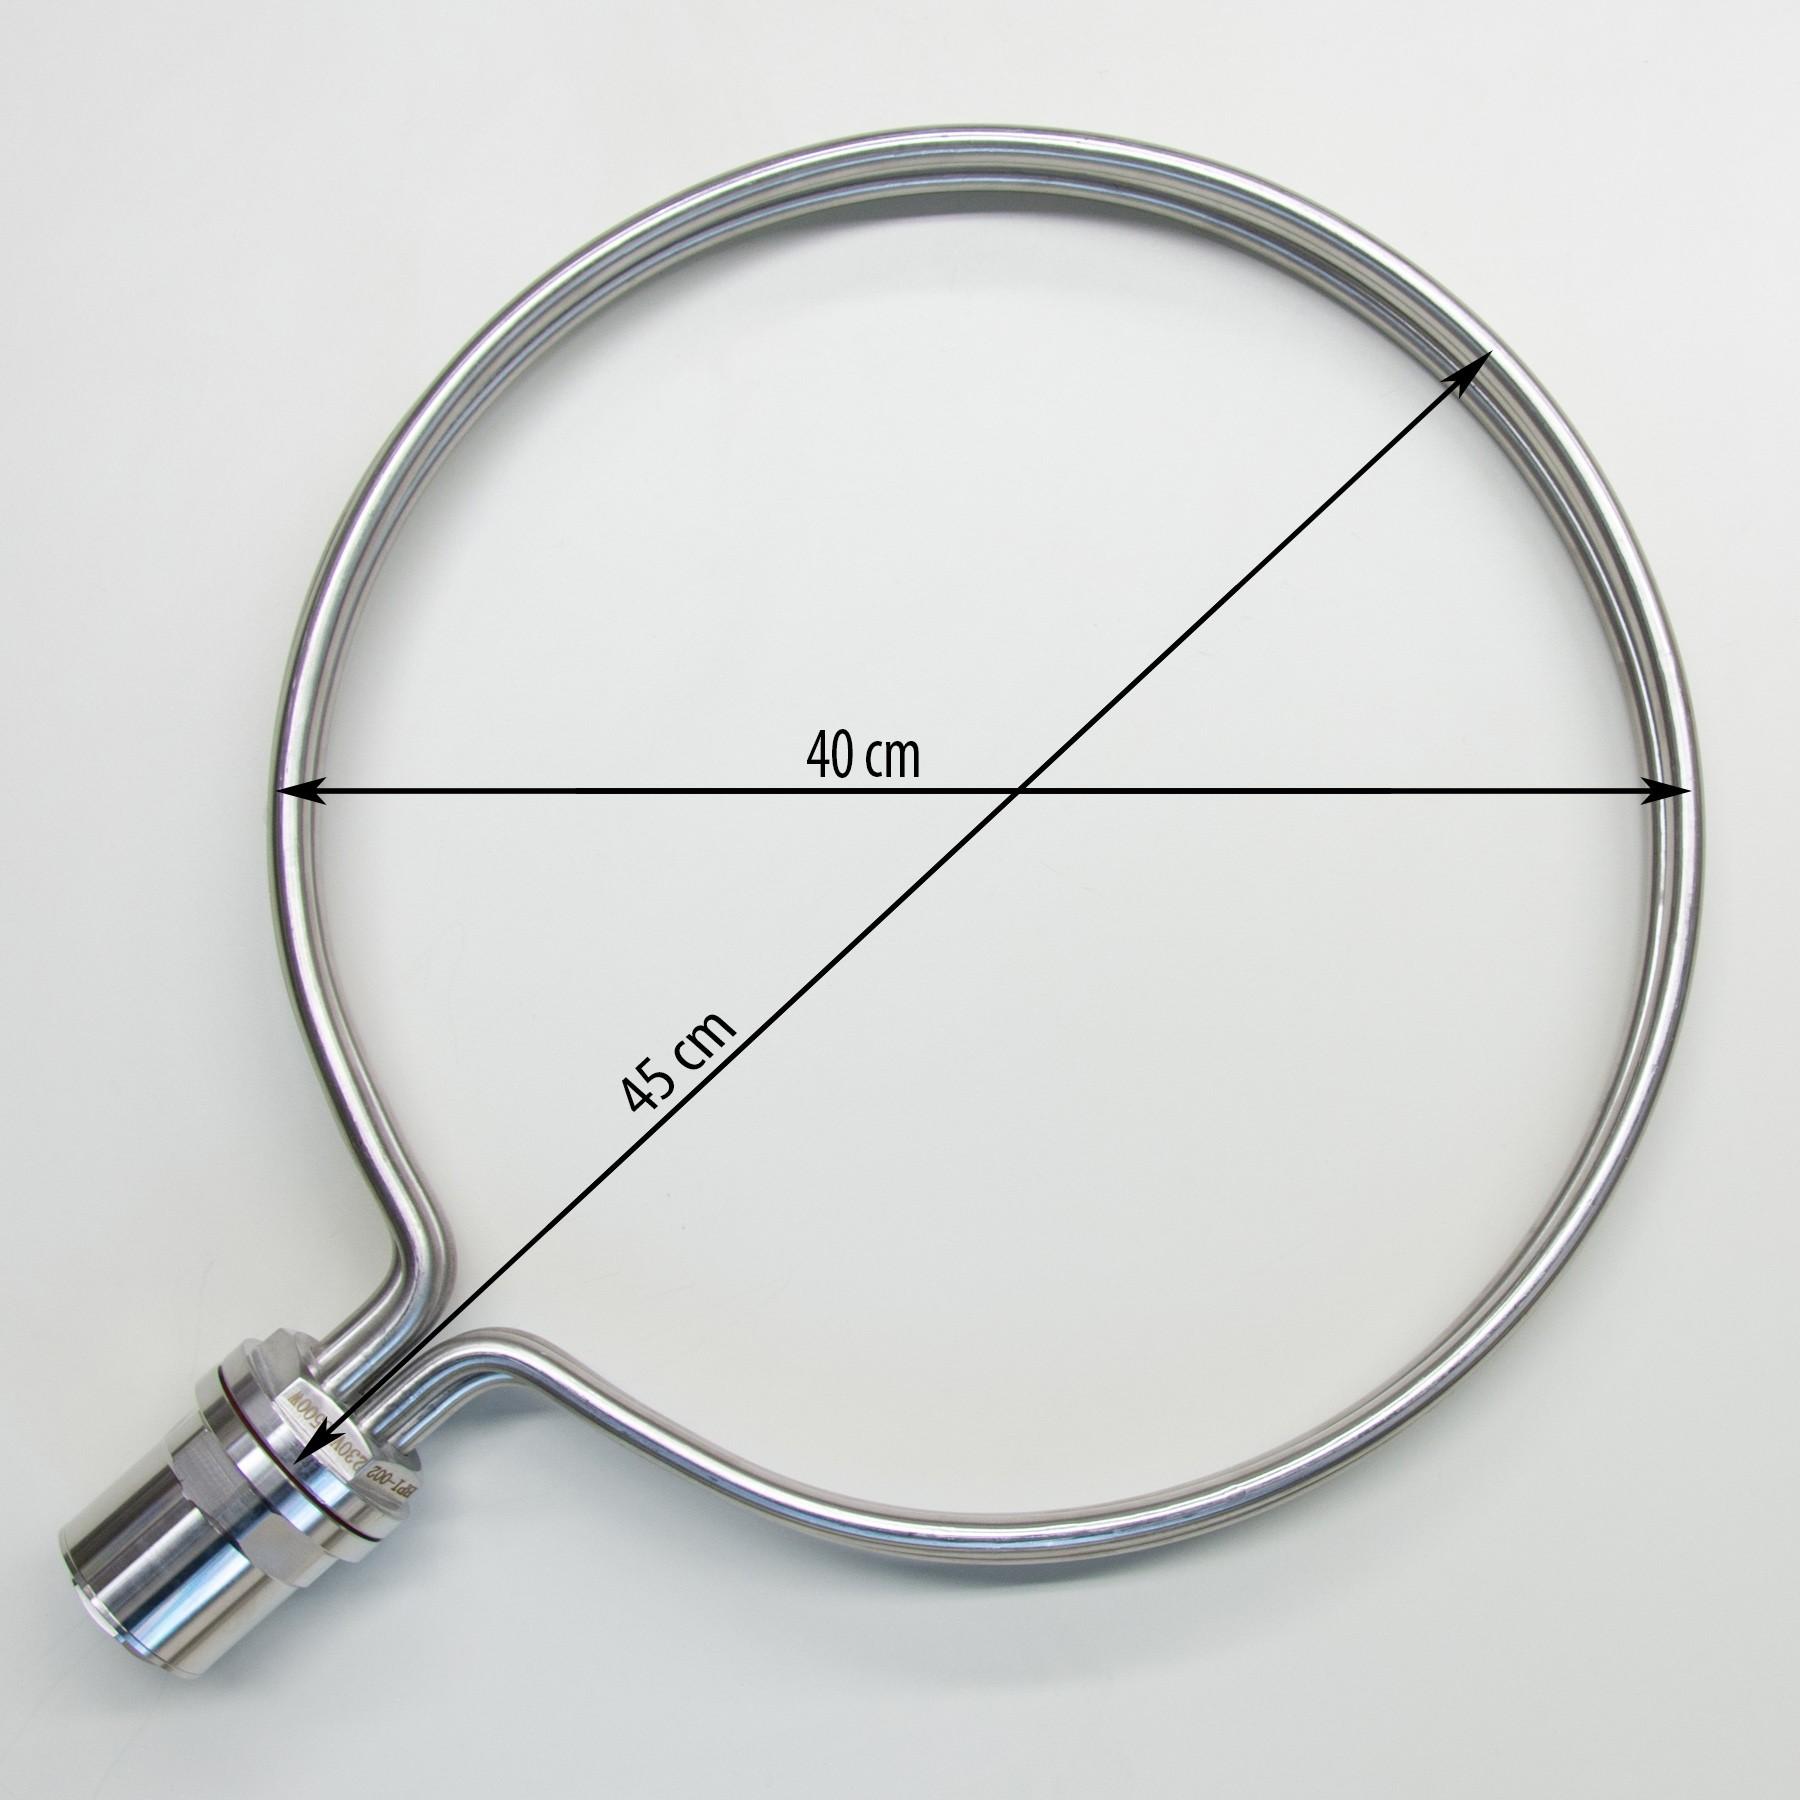 Round Heating Element For Brewing 40cm Diameter 8500w